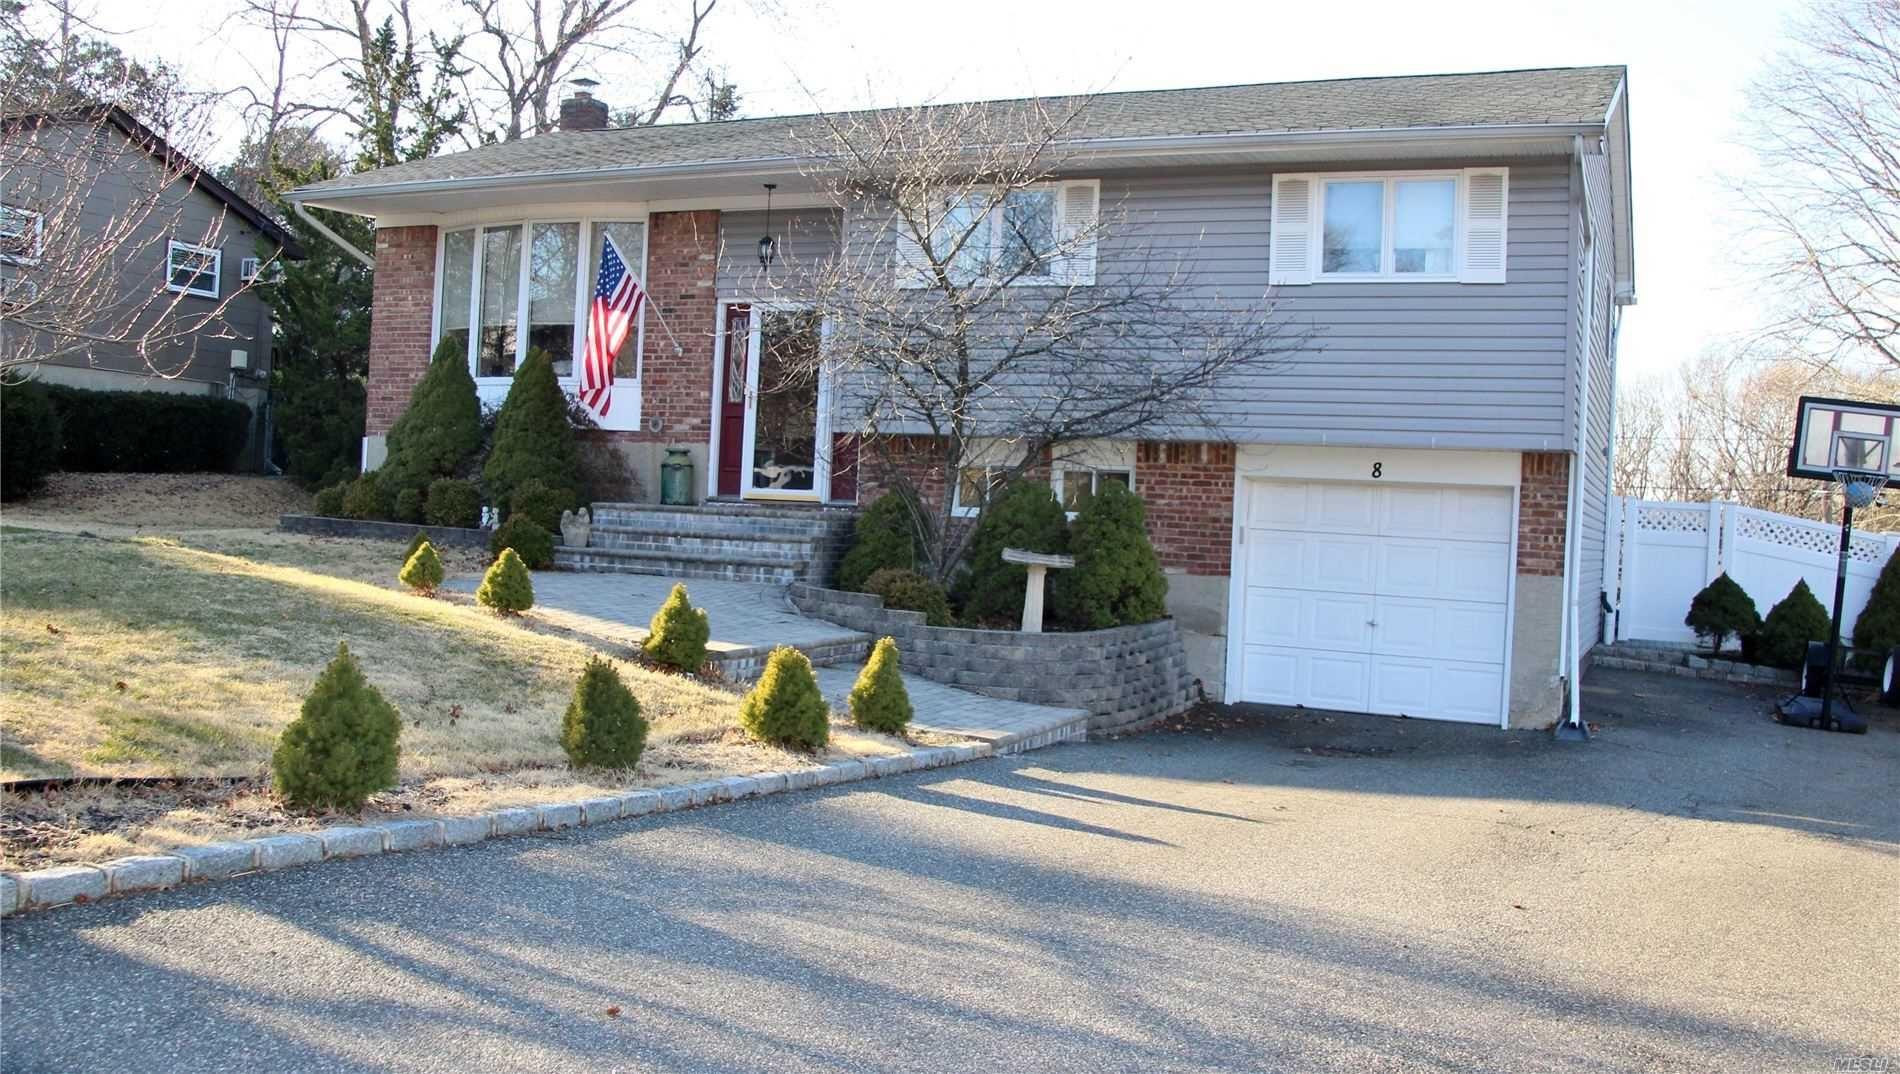 8 Rogers Ln, Smithtown, NY 11787 - MLS#: 3211373